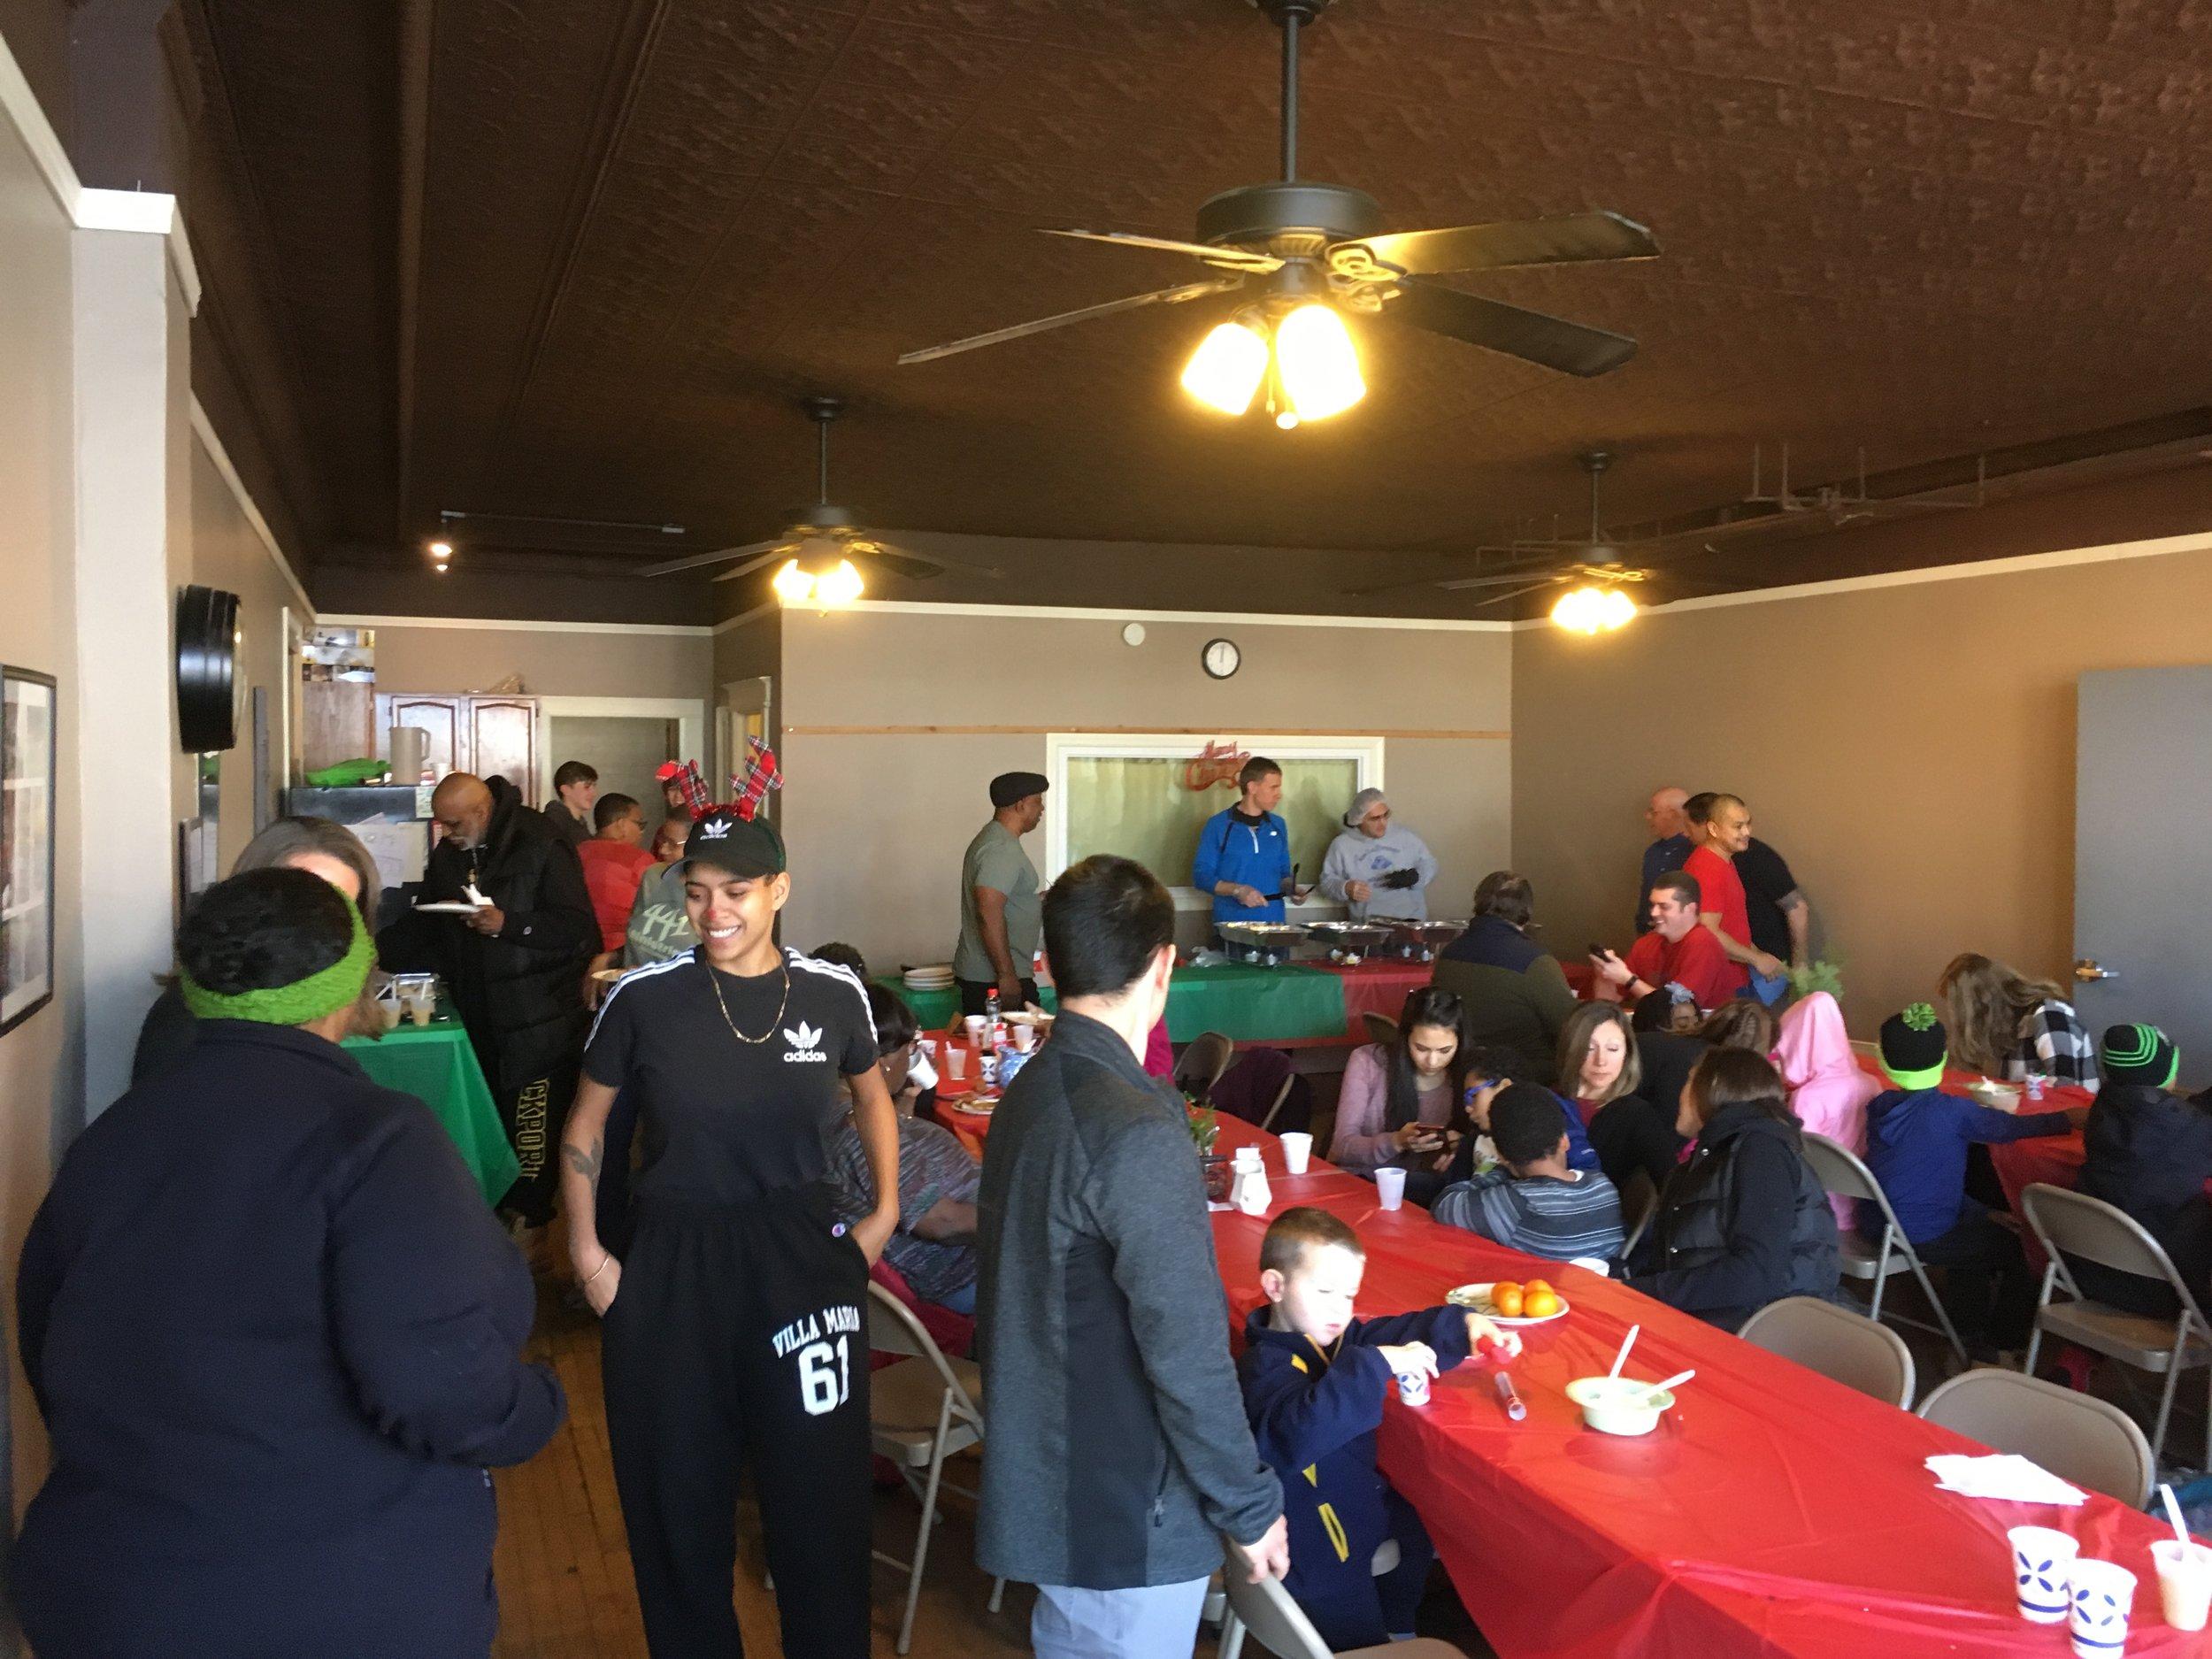 441 Ministries/New City Fellowship Christmas Day Pancake Brunch 2018